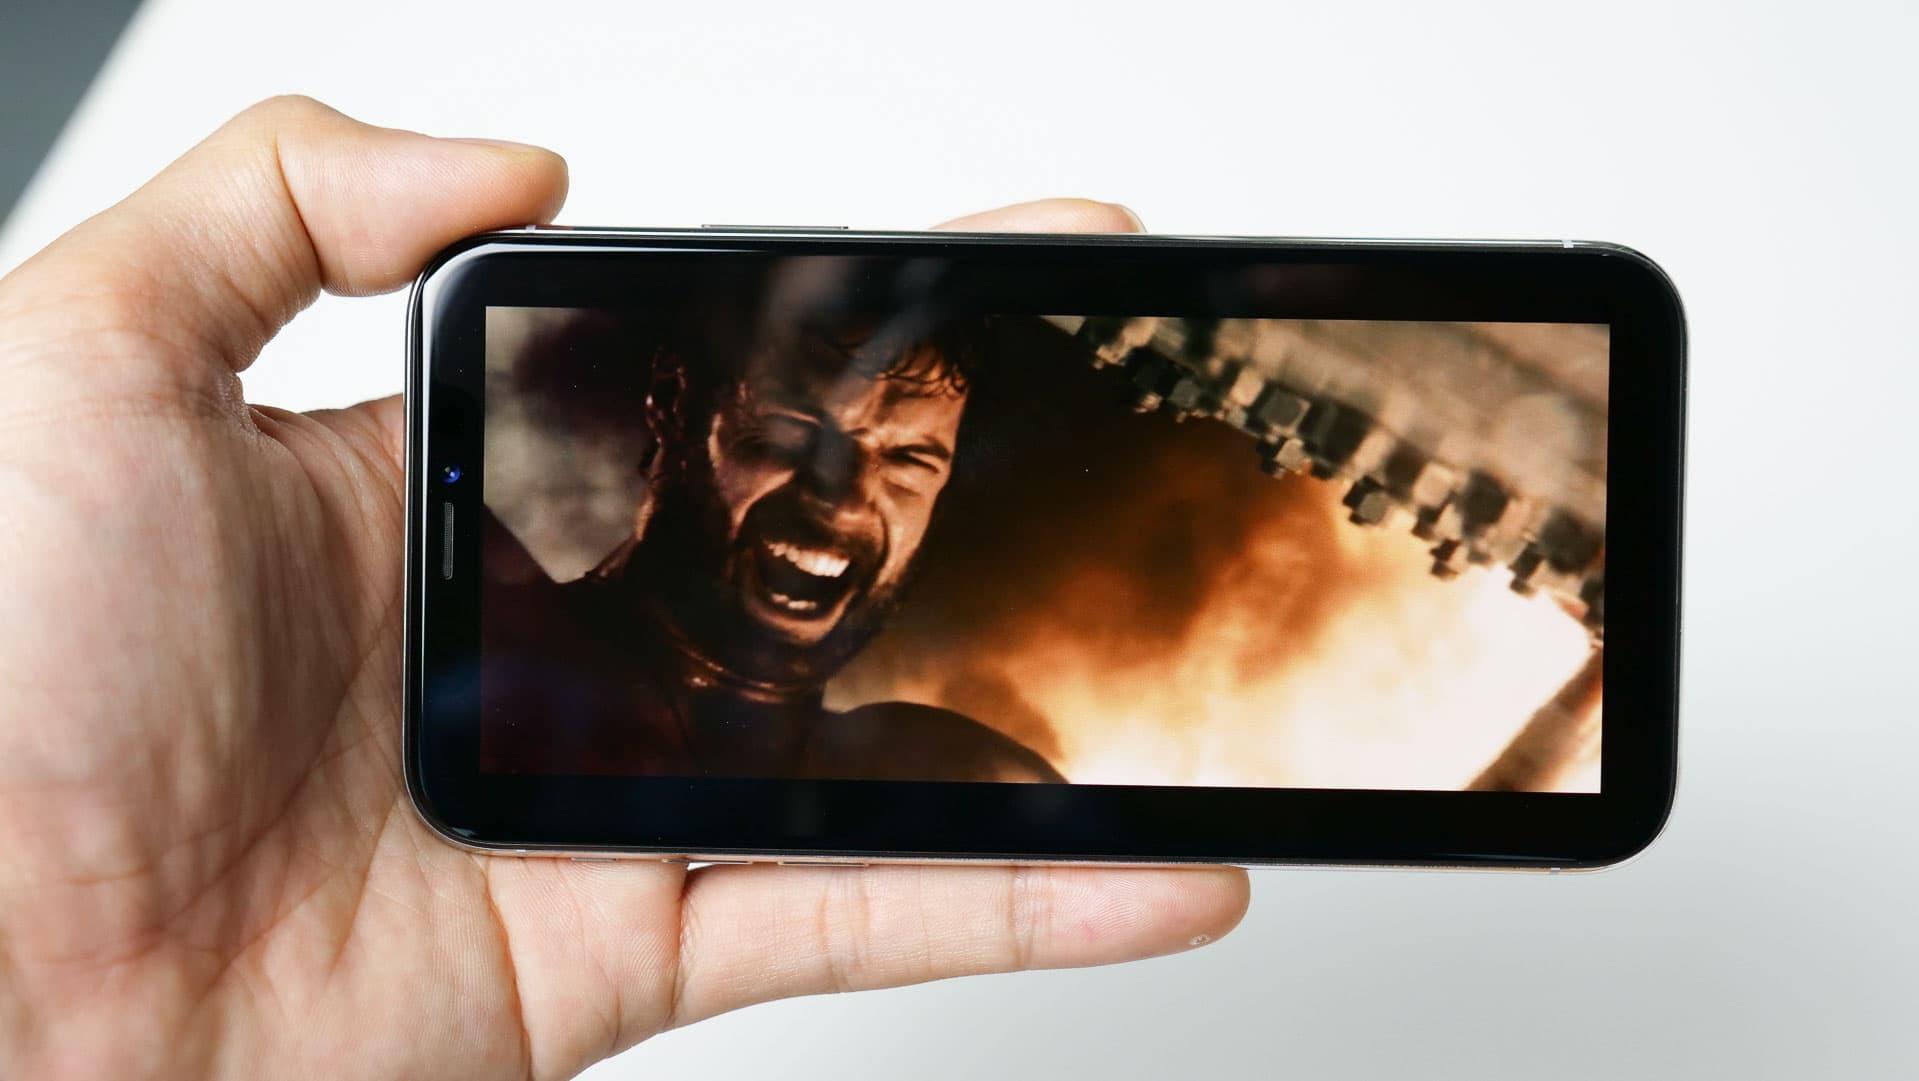 Iphone X Netflix Fit Screen 7534